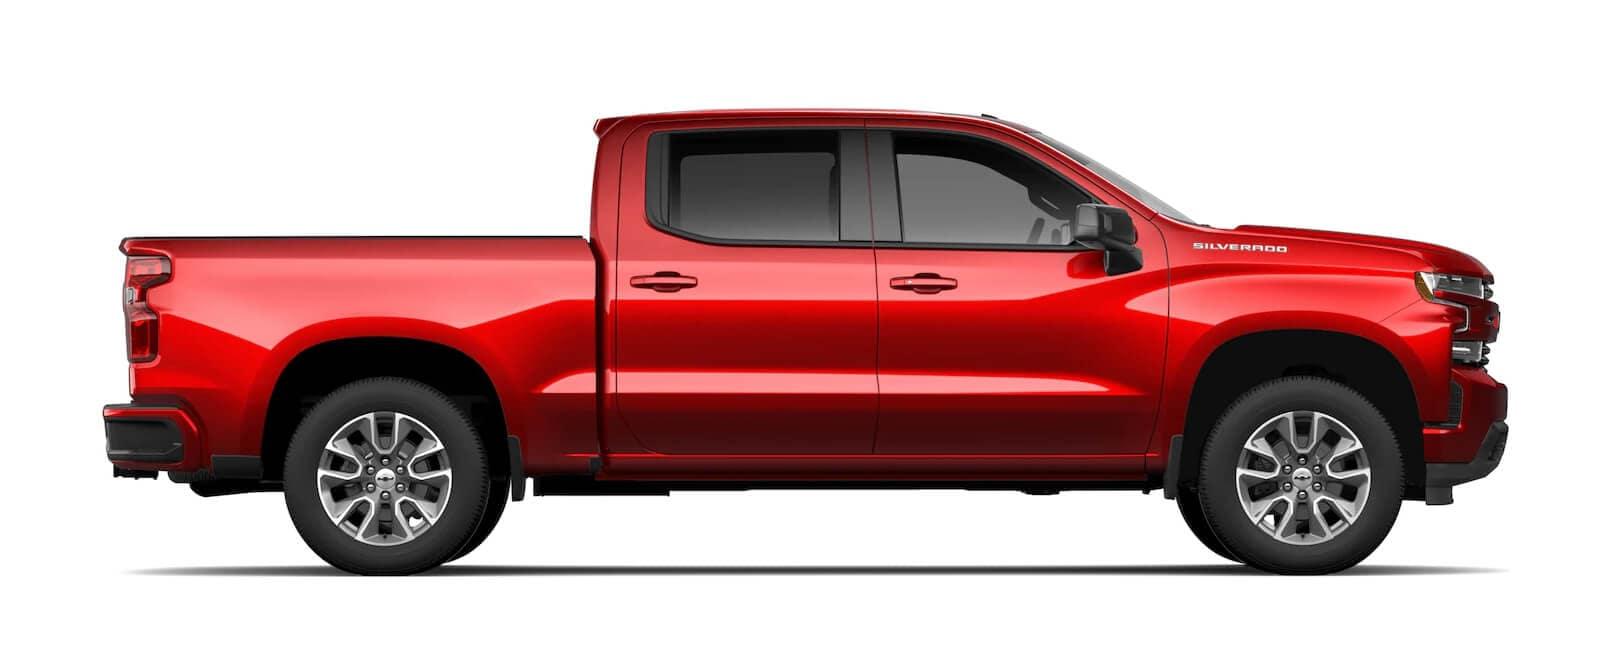 New Chevrolet Vehicles: 2021 Silverado 1500